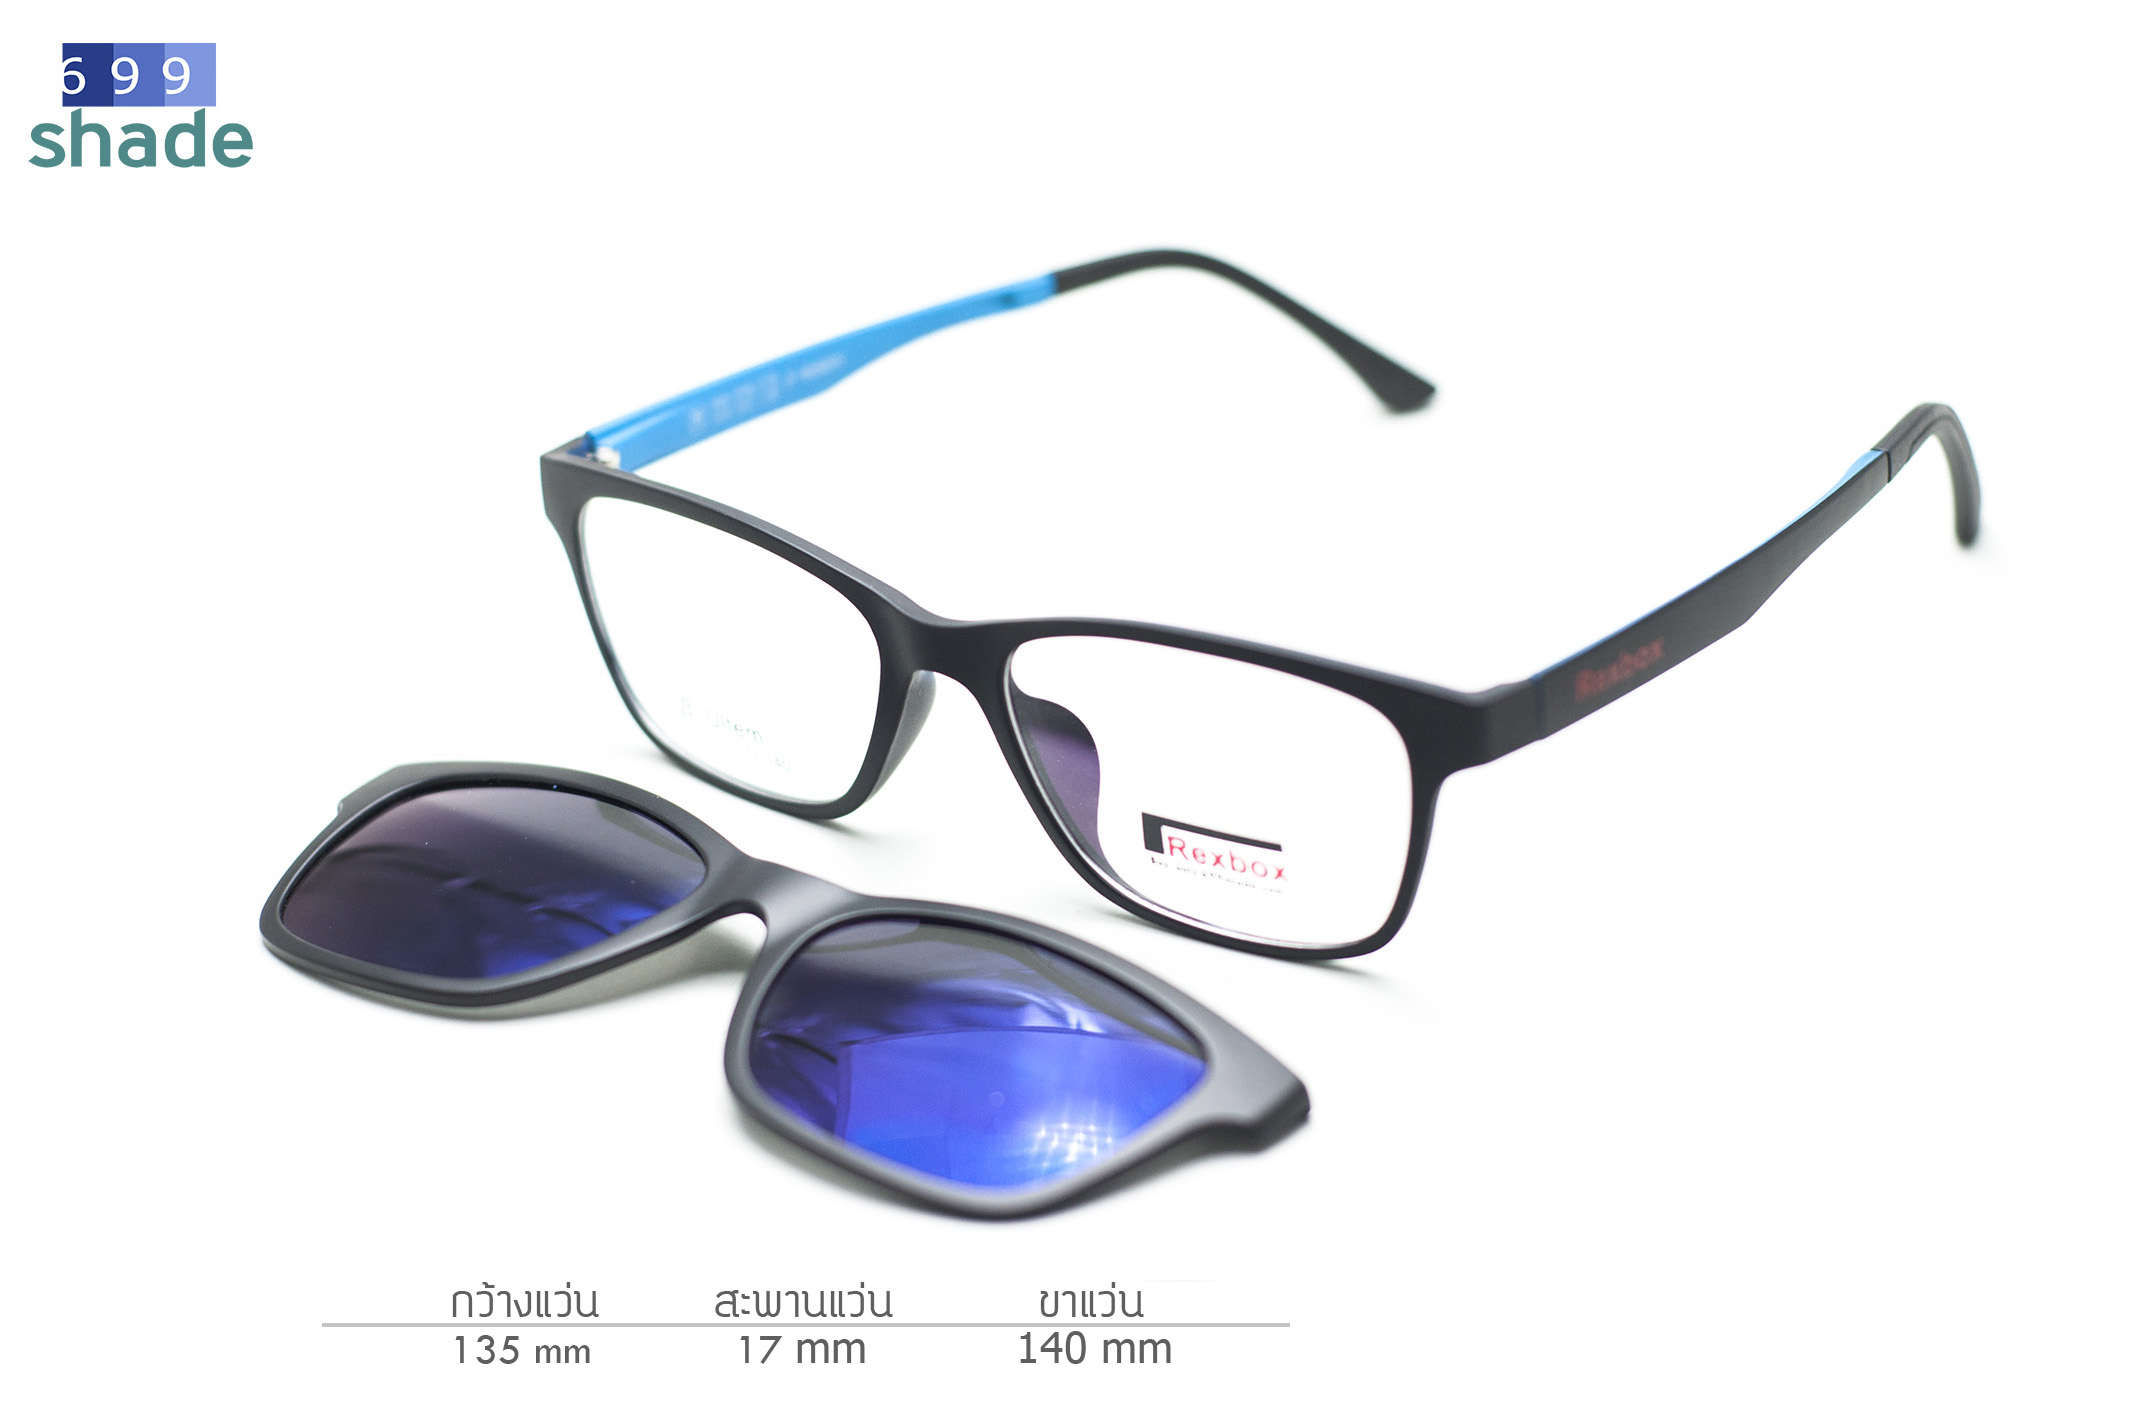 Rexbox Ex2 แว่นคลิปออนแม่เหล็ก [สีดำฟ้า]